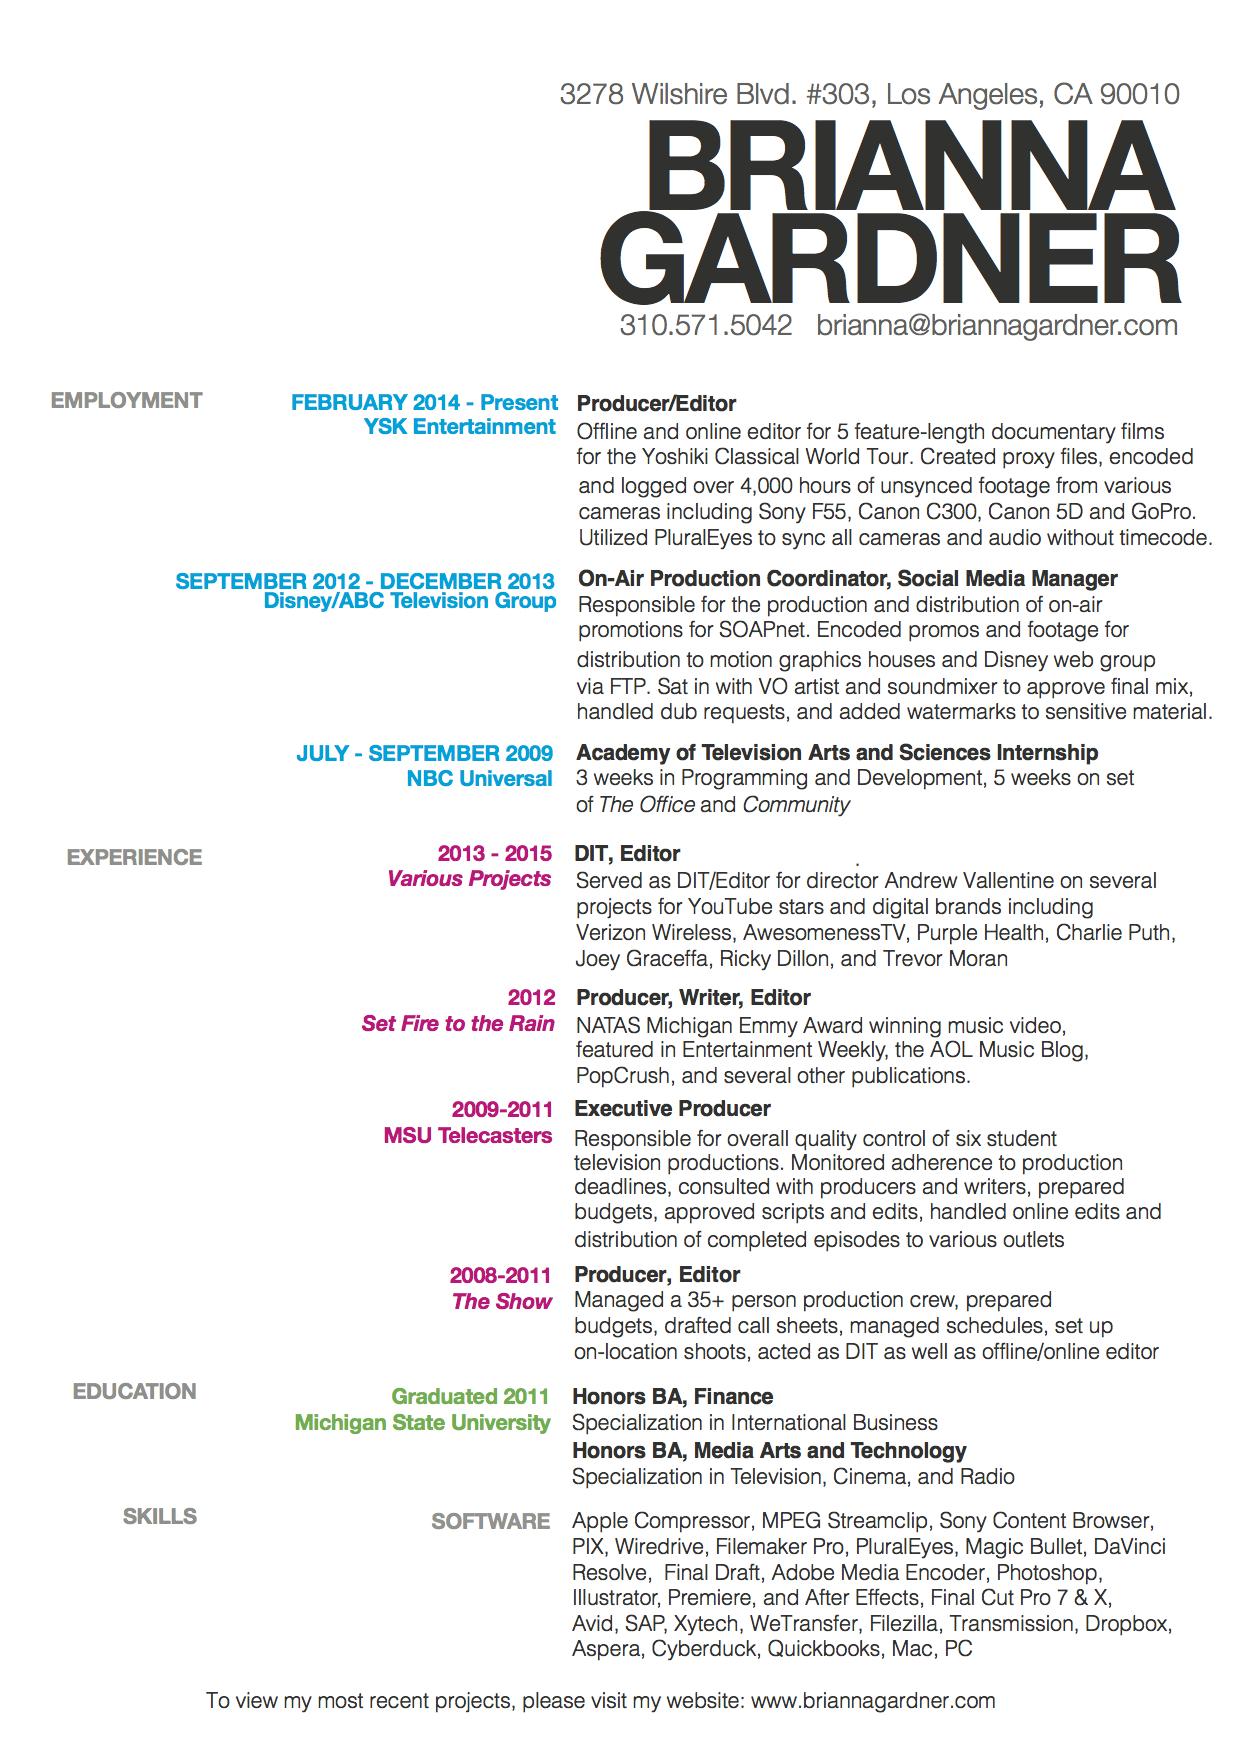 Resume | Offical Site of Editor Brianna Gardner